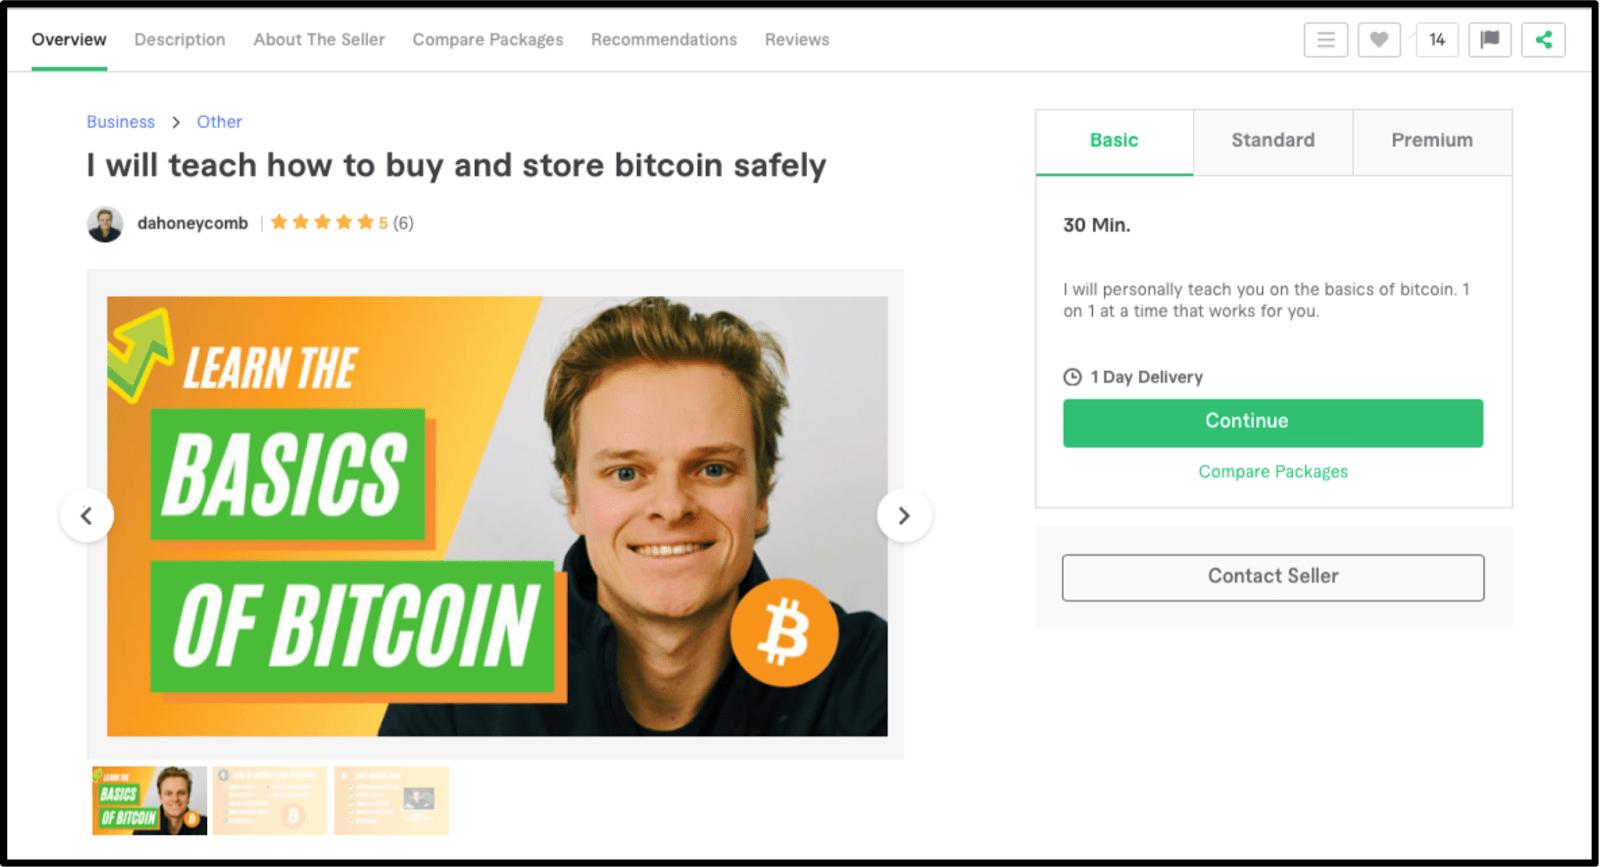 Bitcoin expert Dahoneycomb Fiverr profile